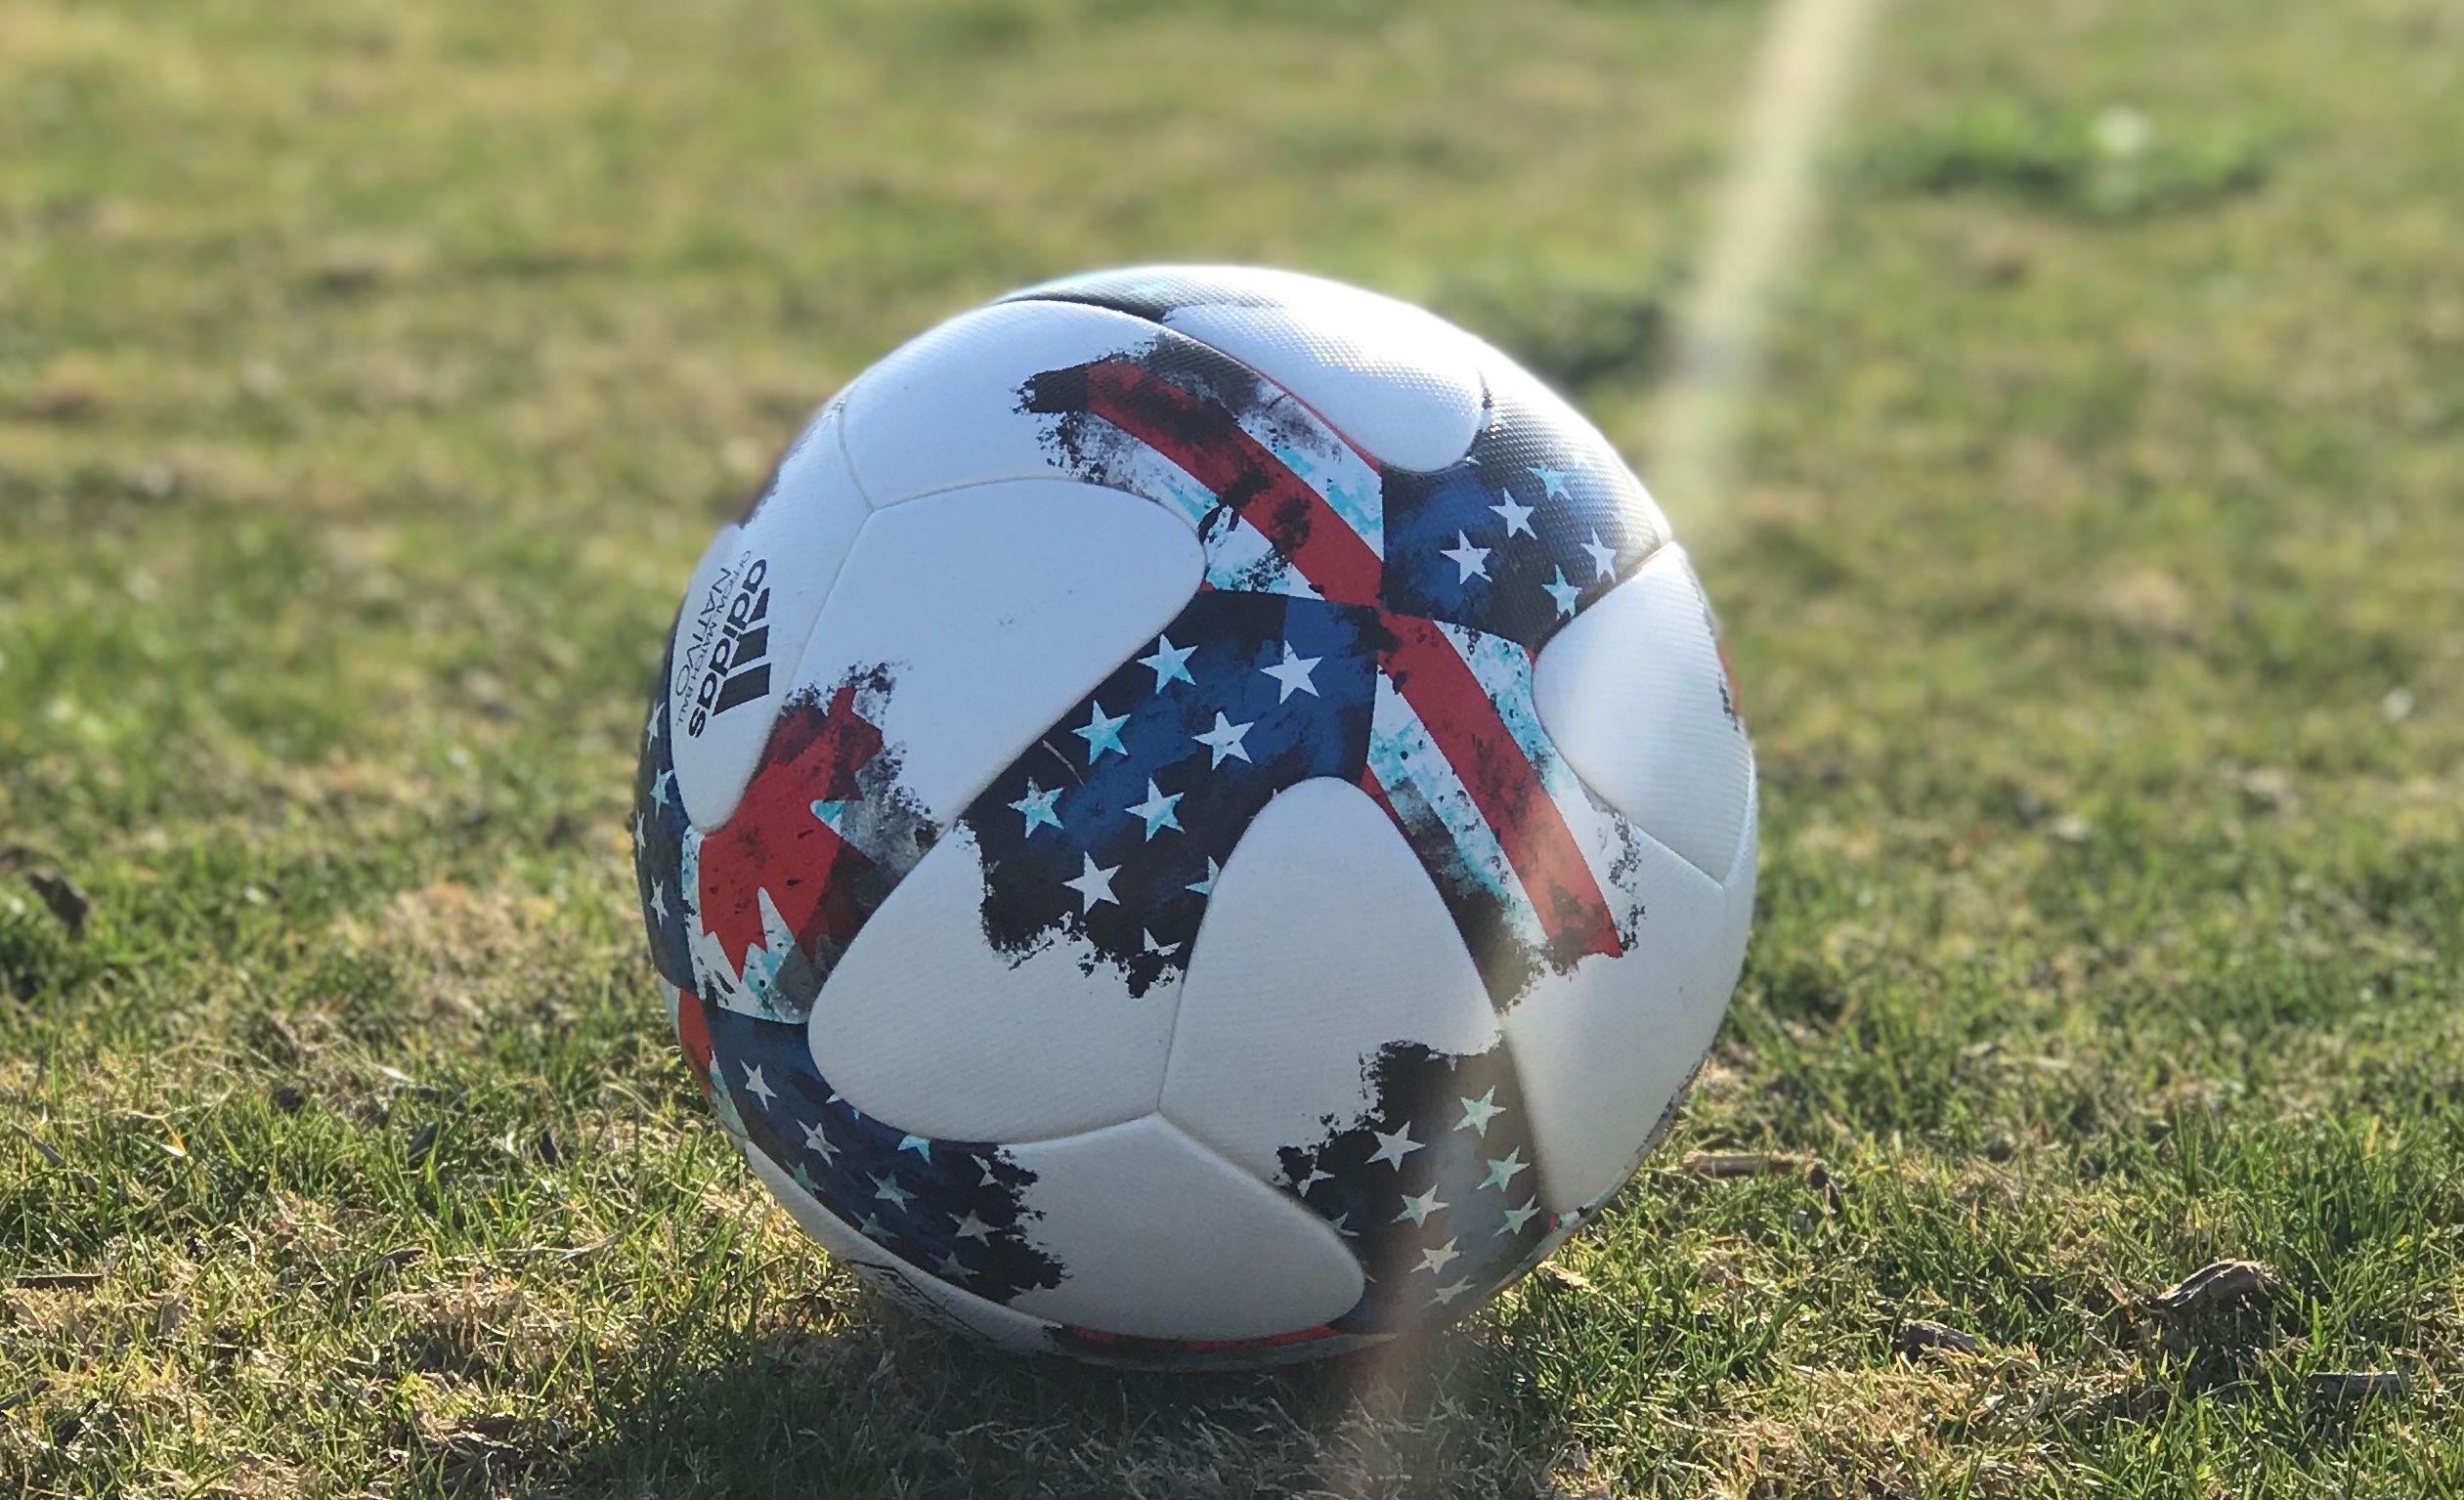 Newport Beach Adult Pick-Up Soccer (Coed) - Sunday